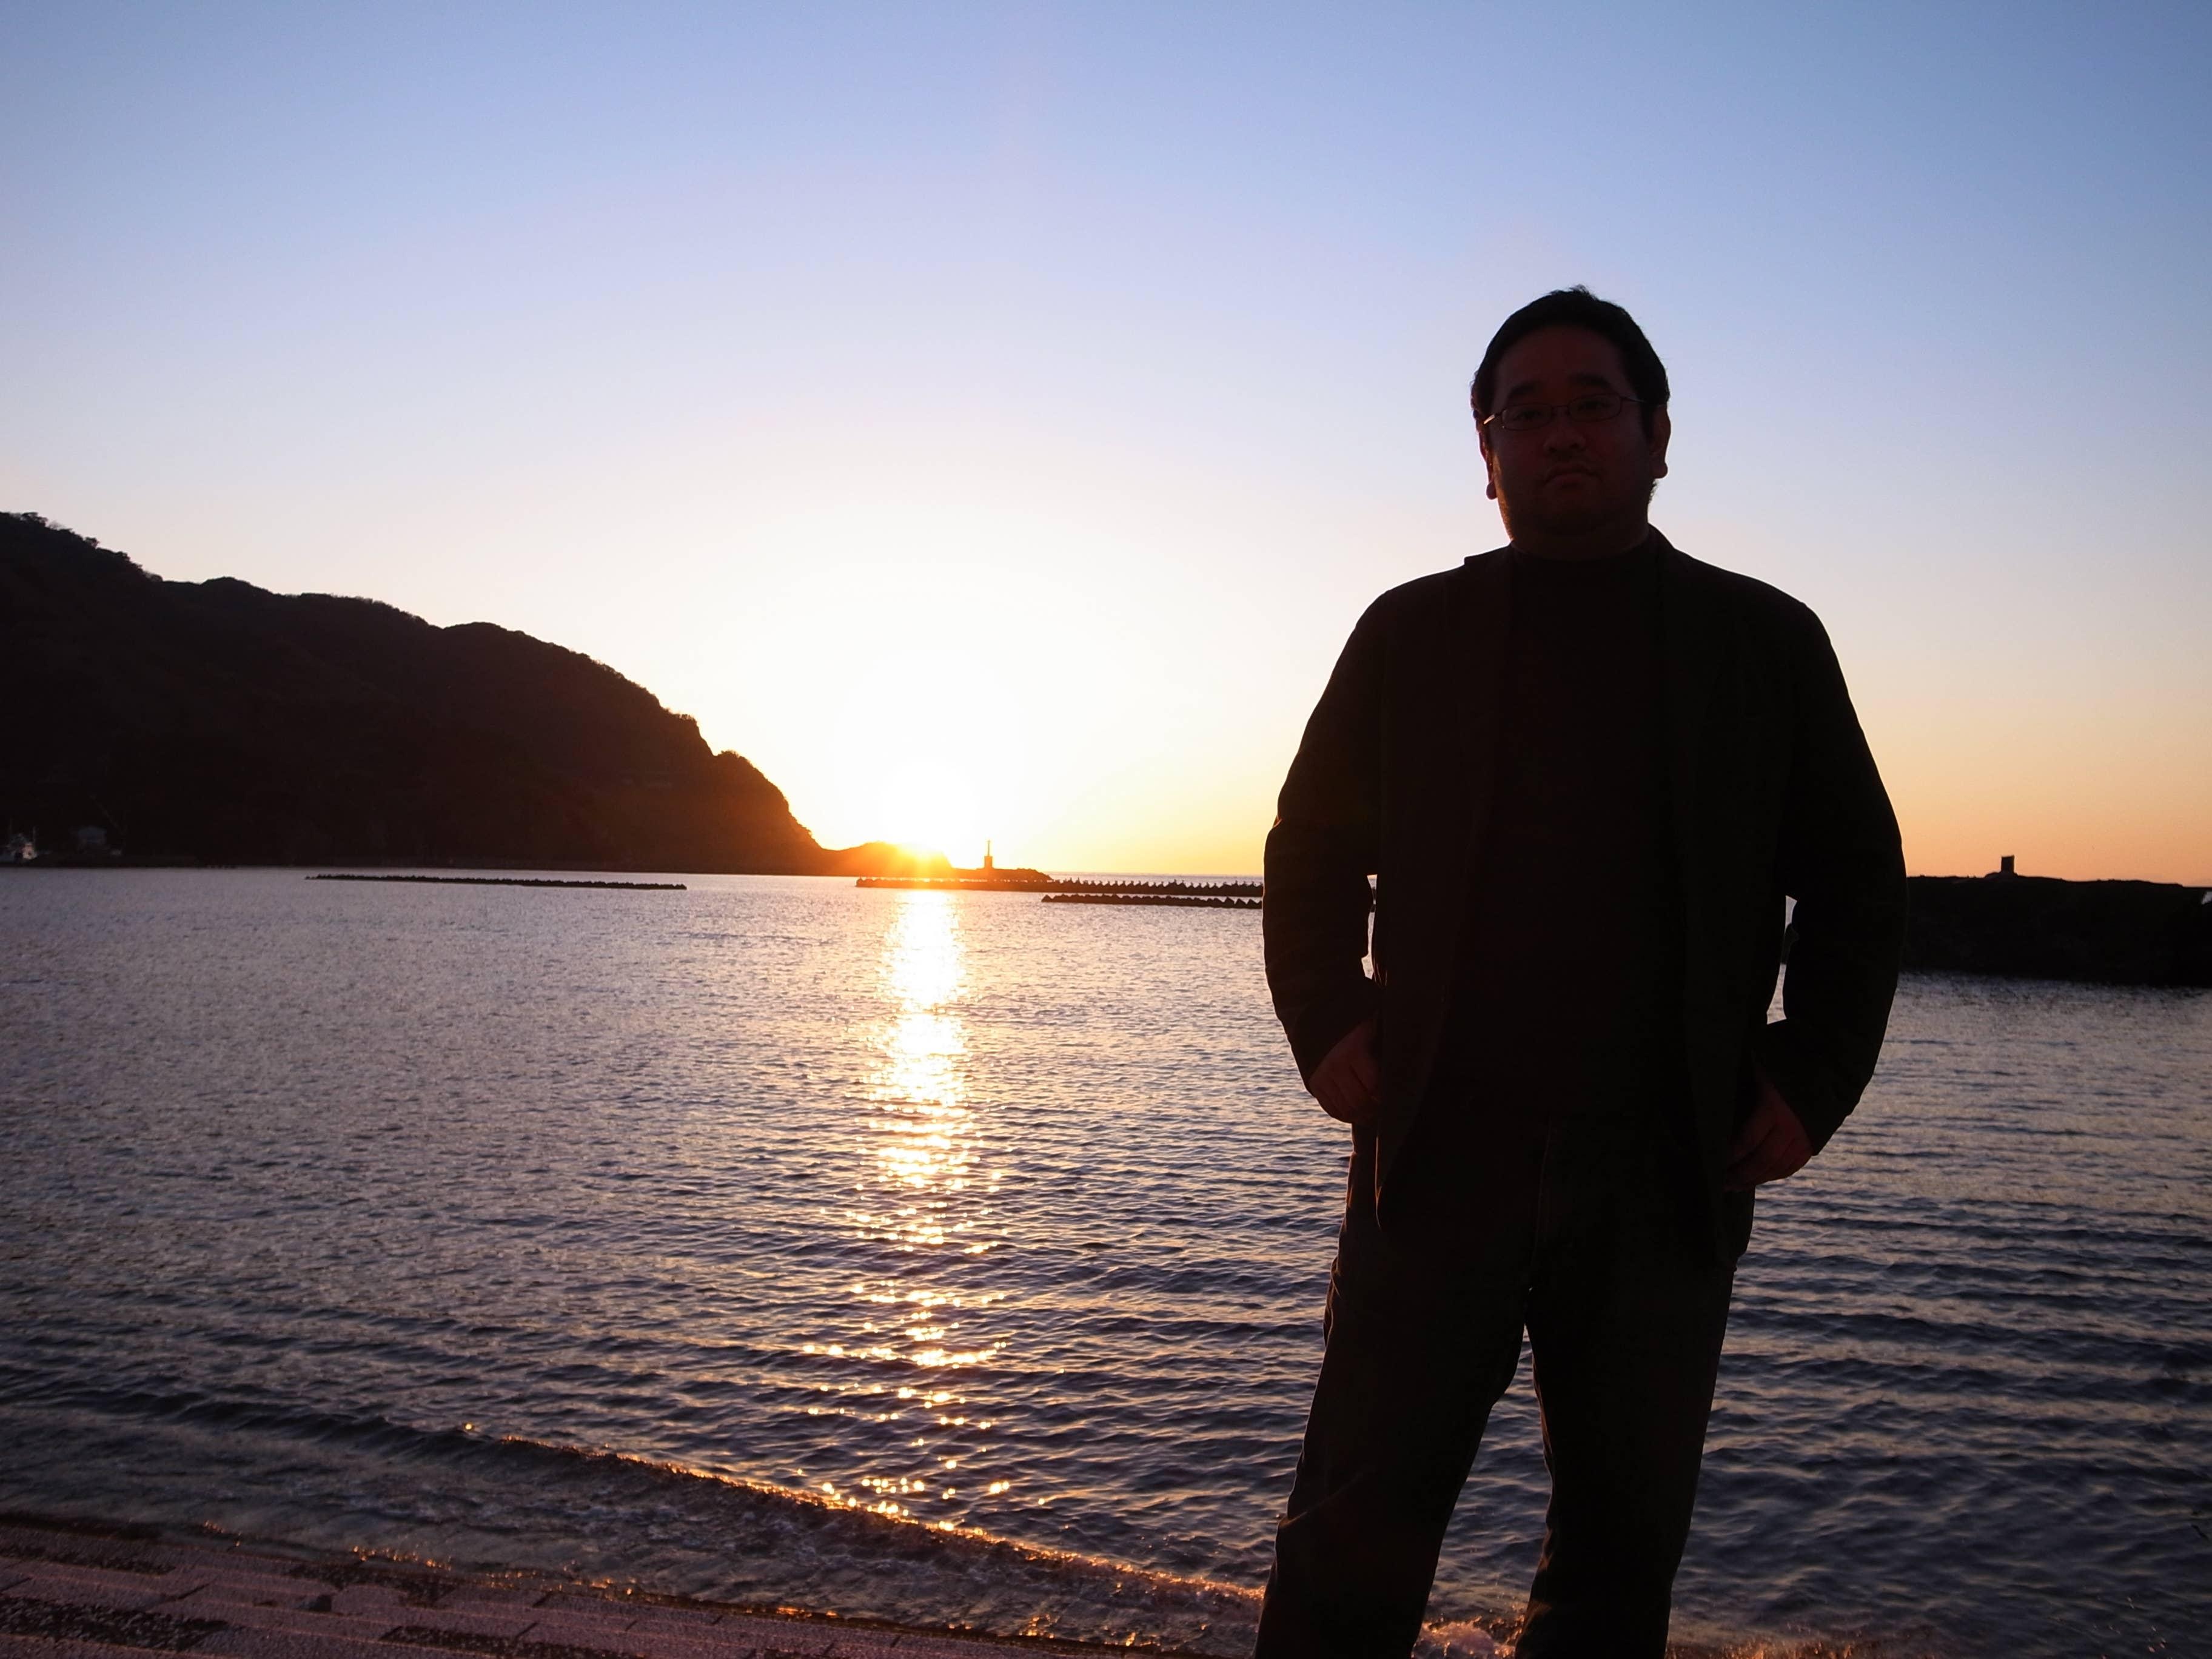 Makoto Nagaiwa